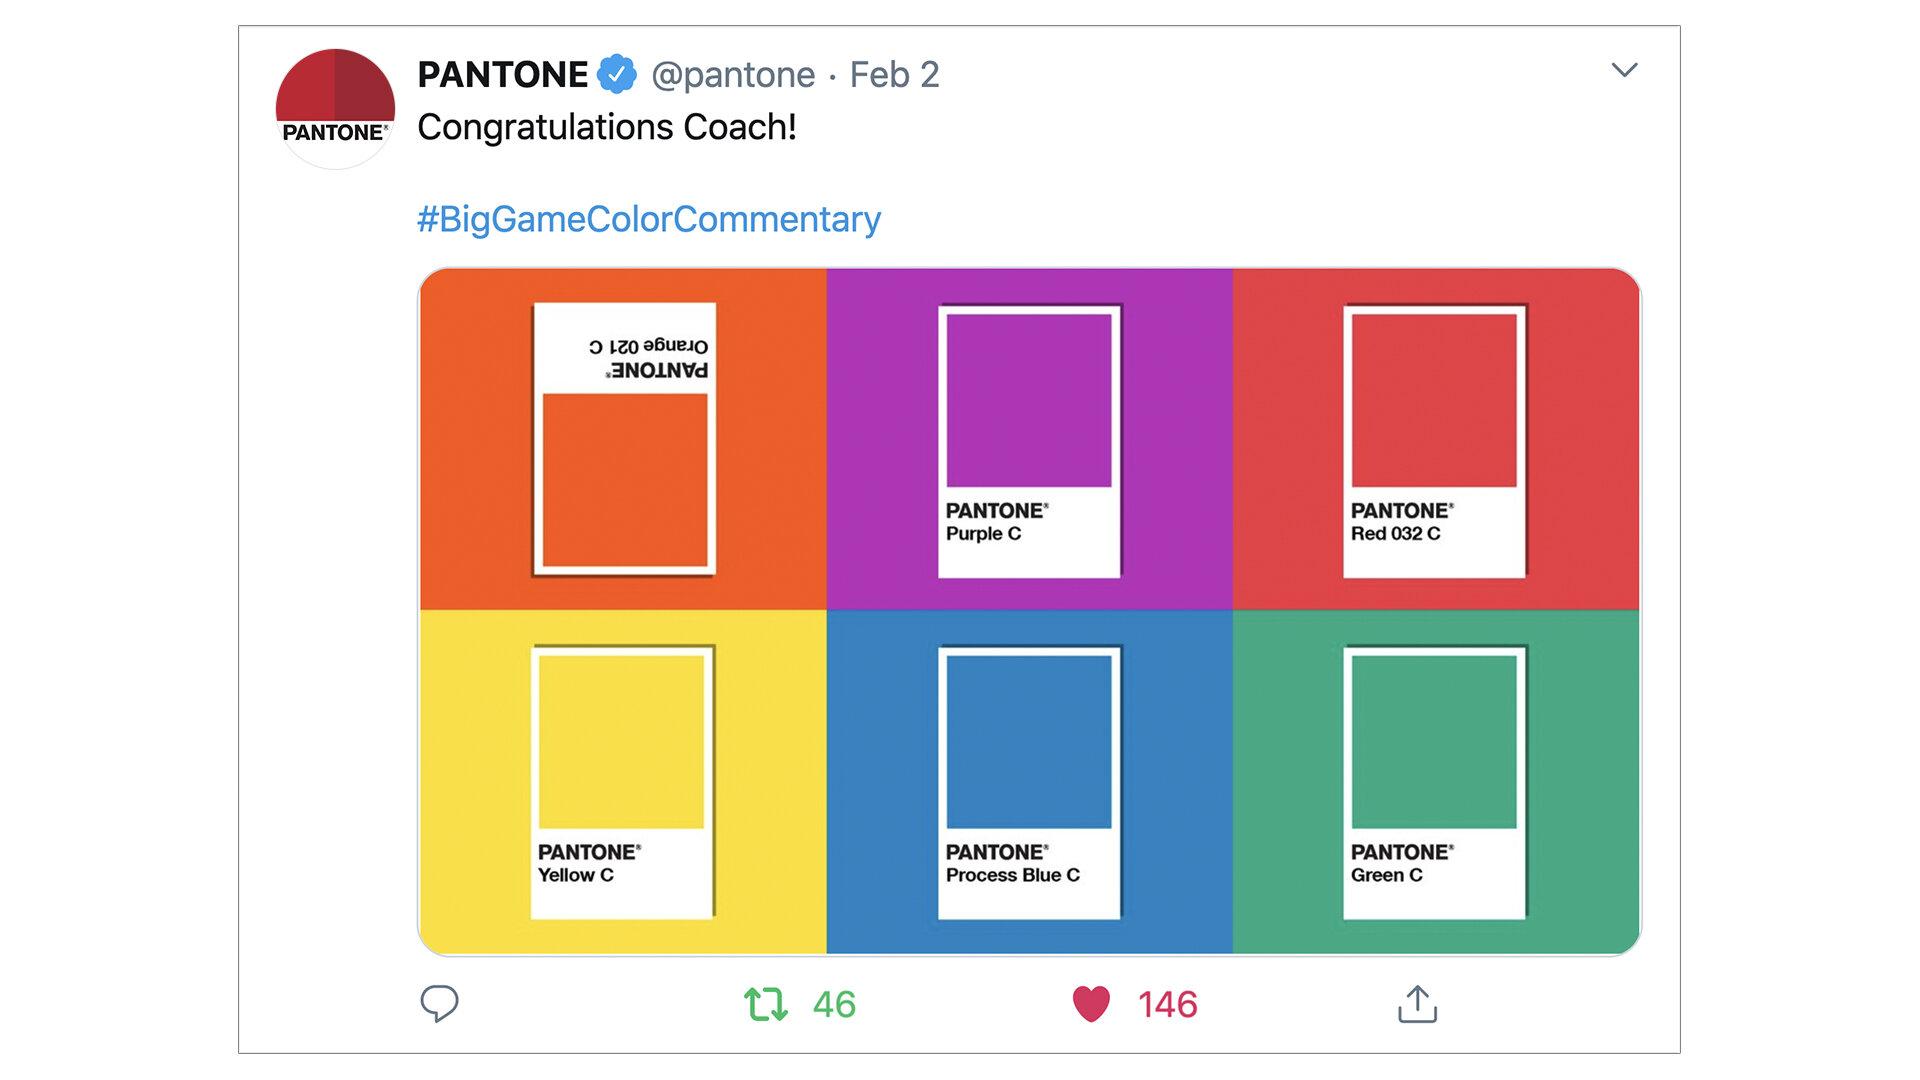 PANTONE_TheDayOf_CongratsCoach